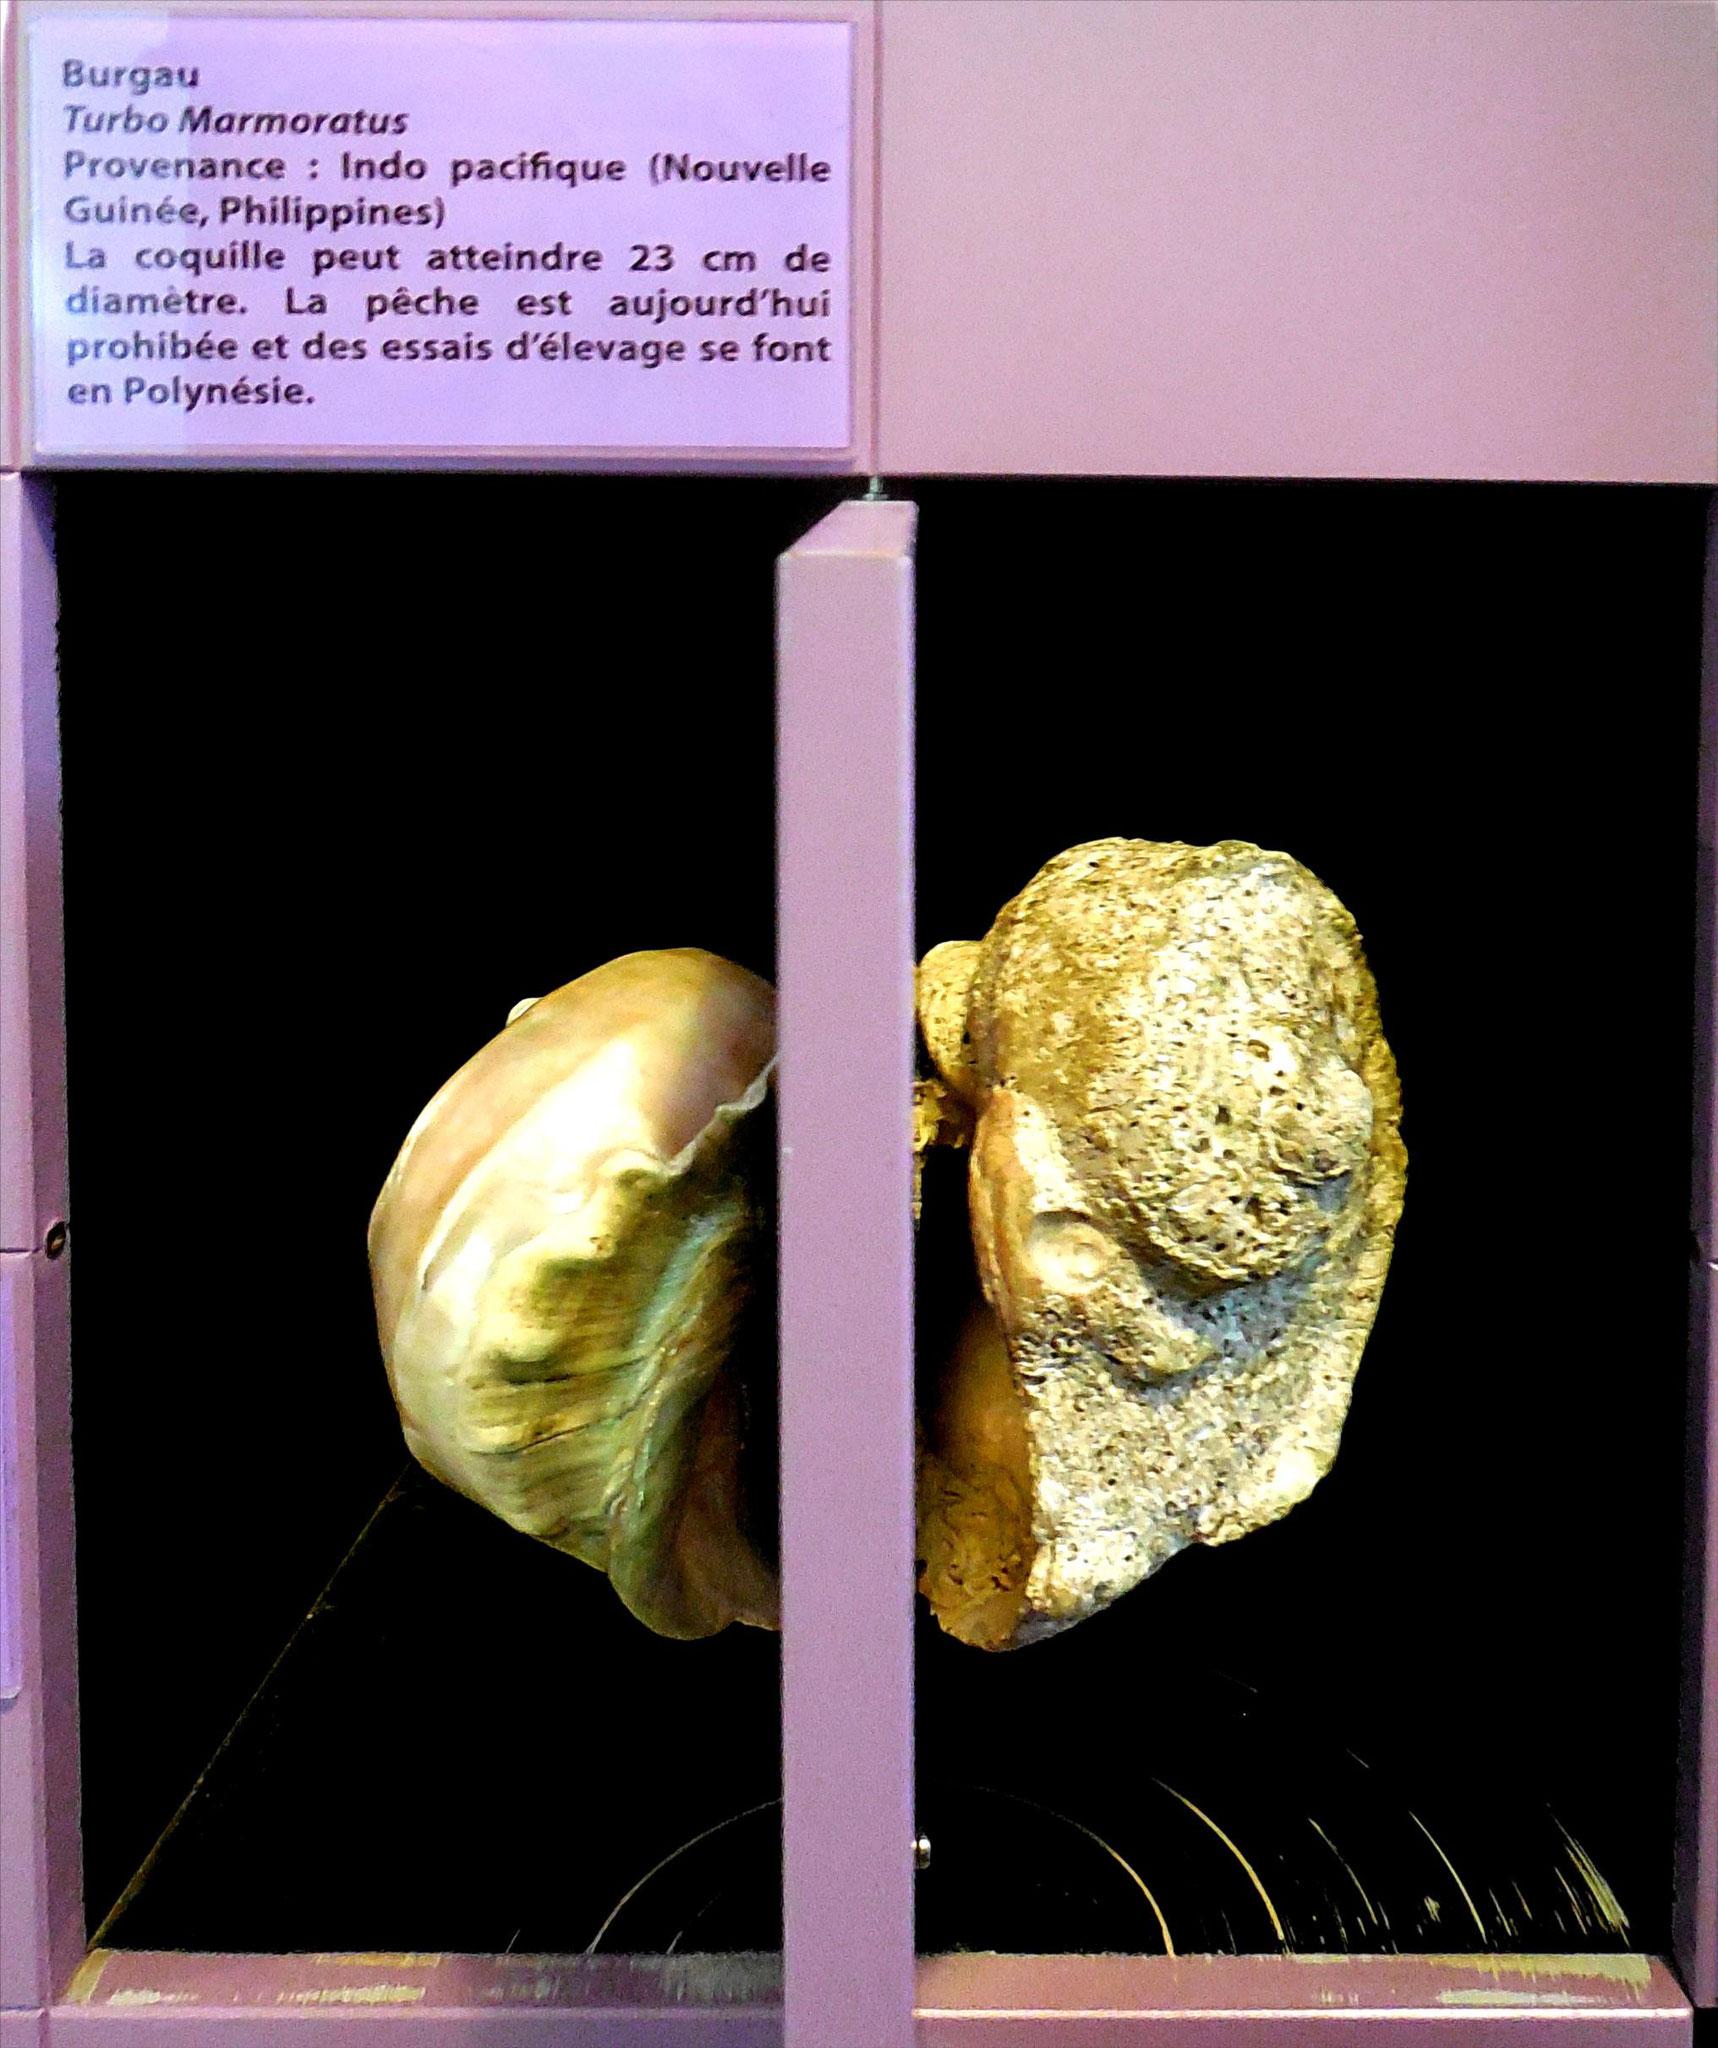 Burgau, un des principaux substituts de la nacre